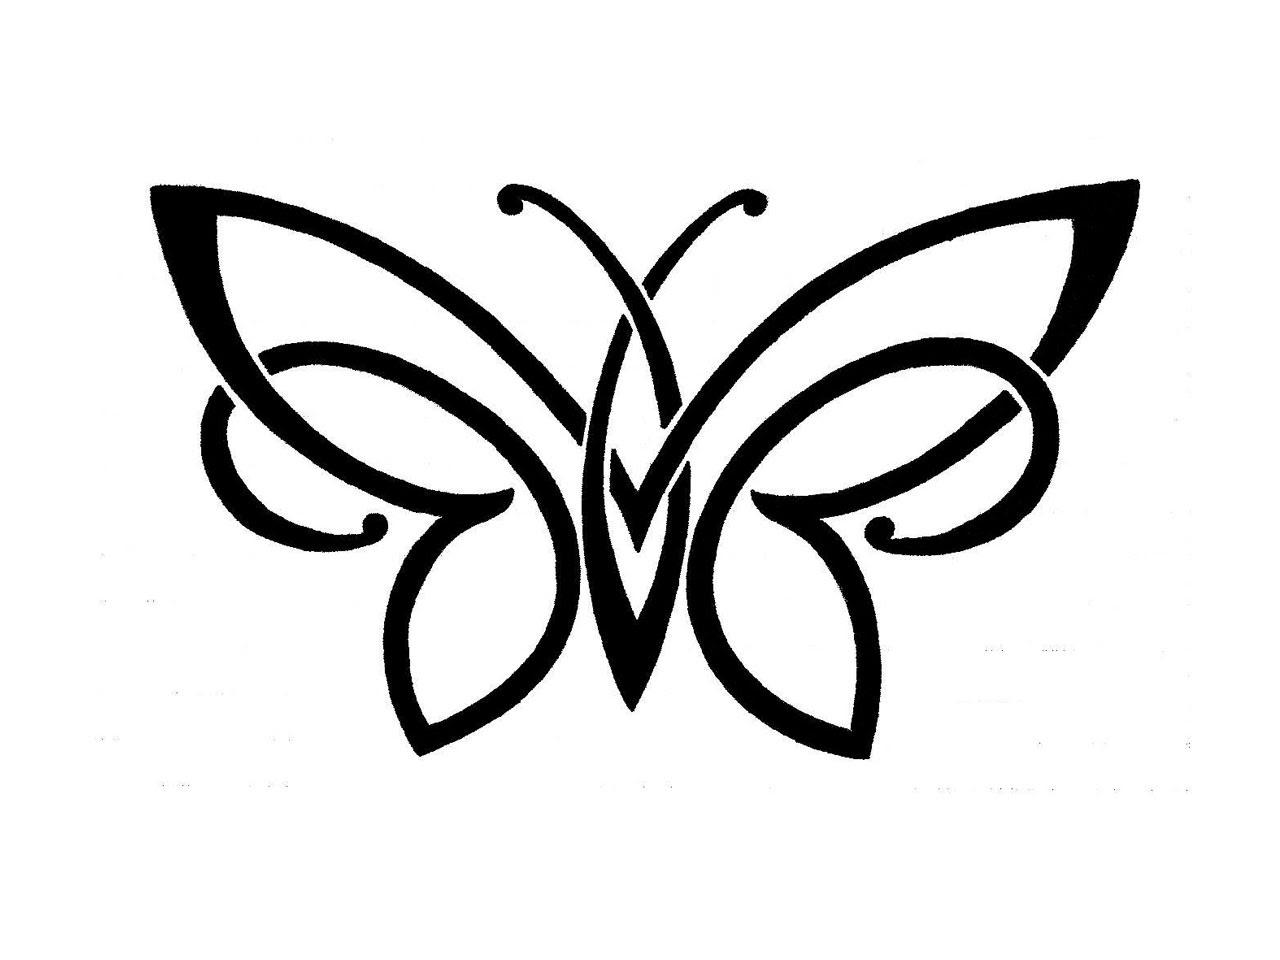 Simple Black And White Tattoo Designs Tattoos Designs Ideas